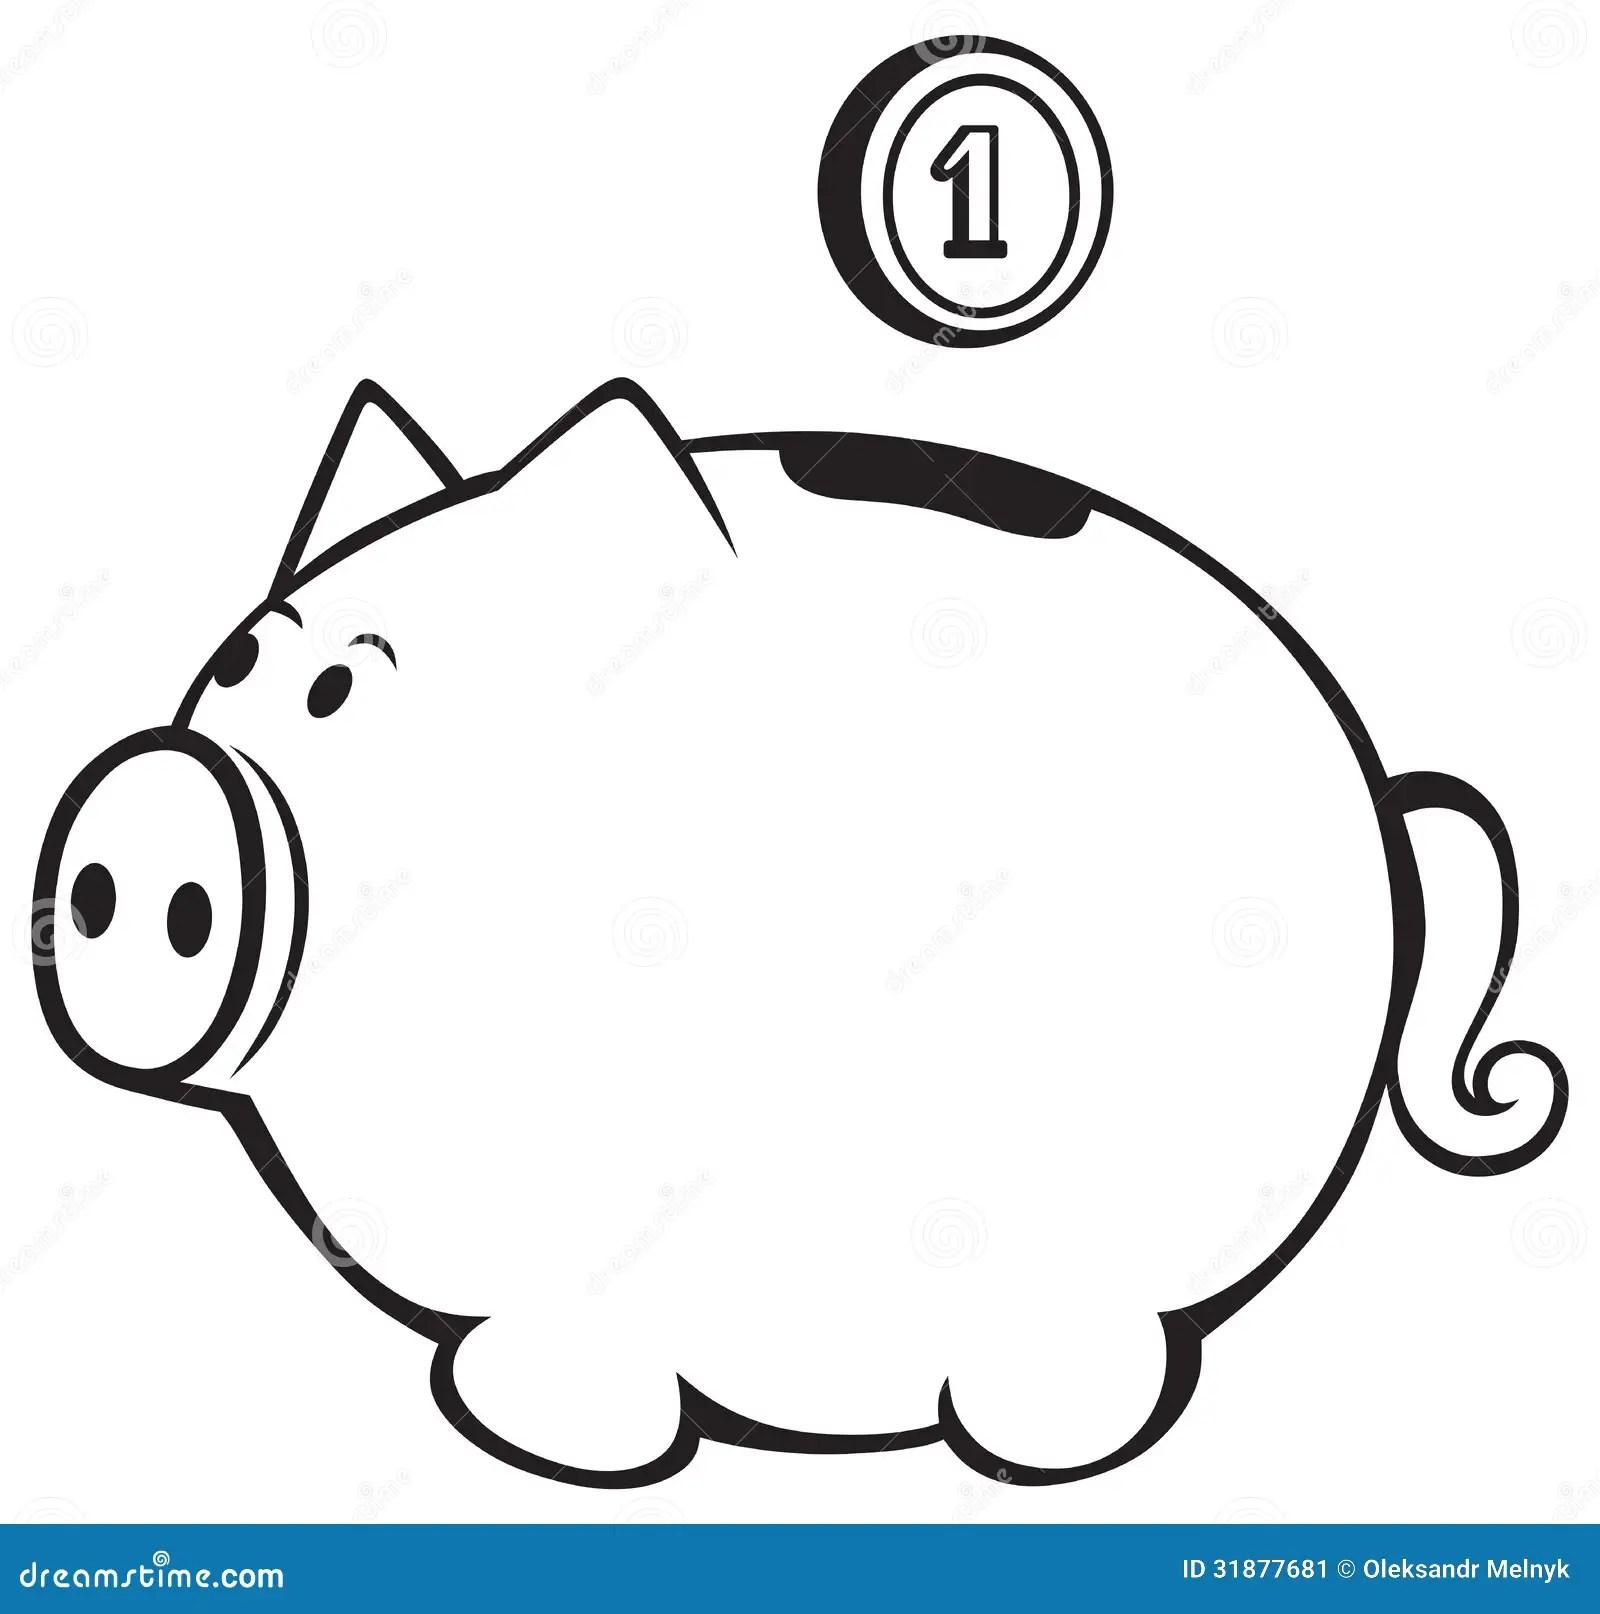 Piggy bank stock vector. Illustration of banking, money